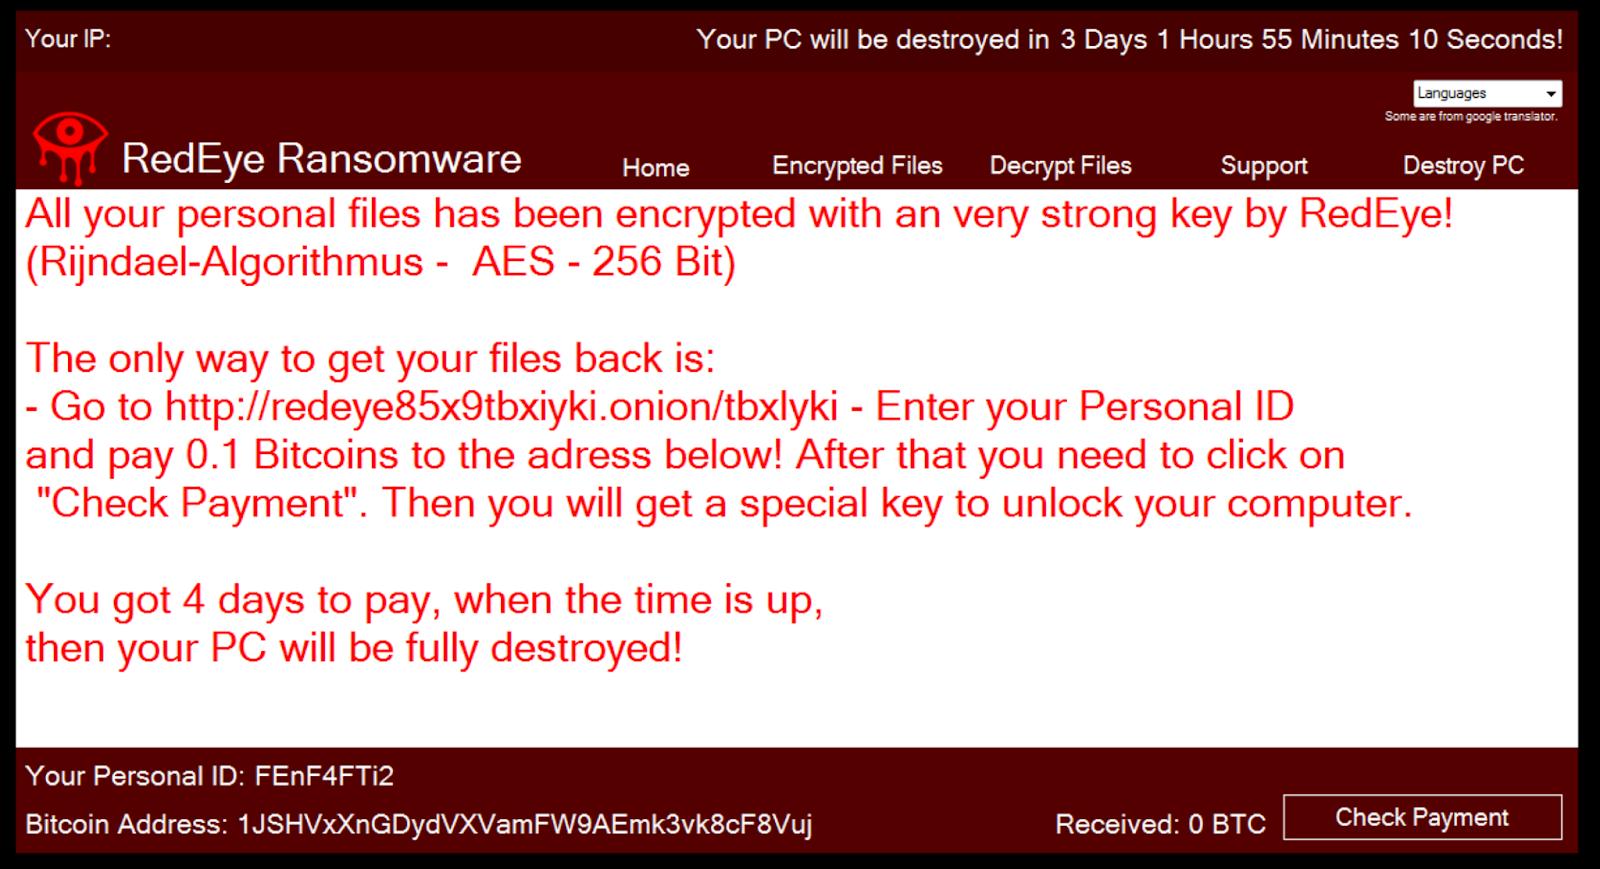 Ransom Note of RedEye Ransomware